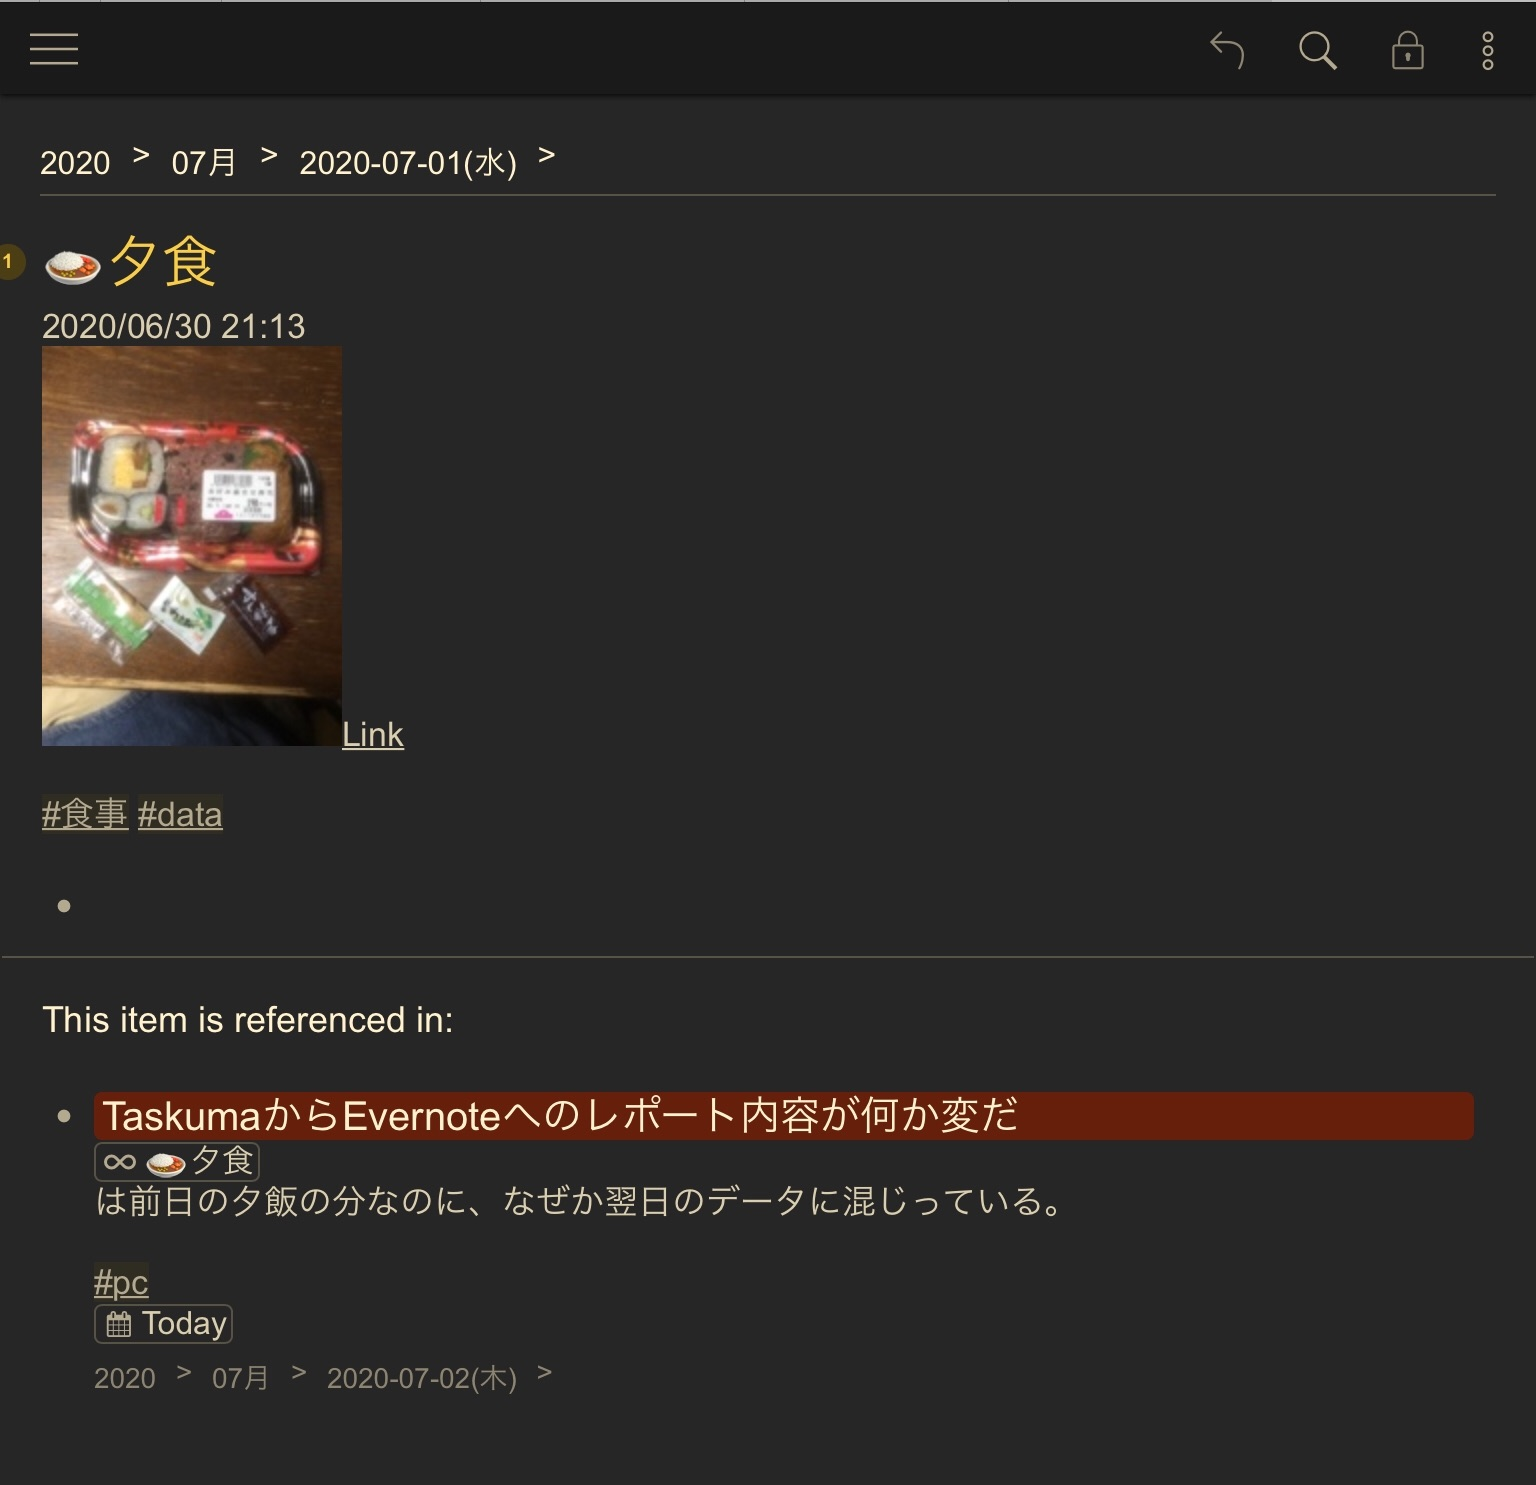 f:id:sorashima:20200702193409j:plain:w637